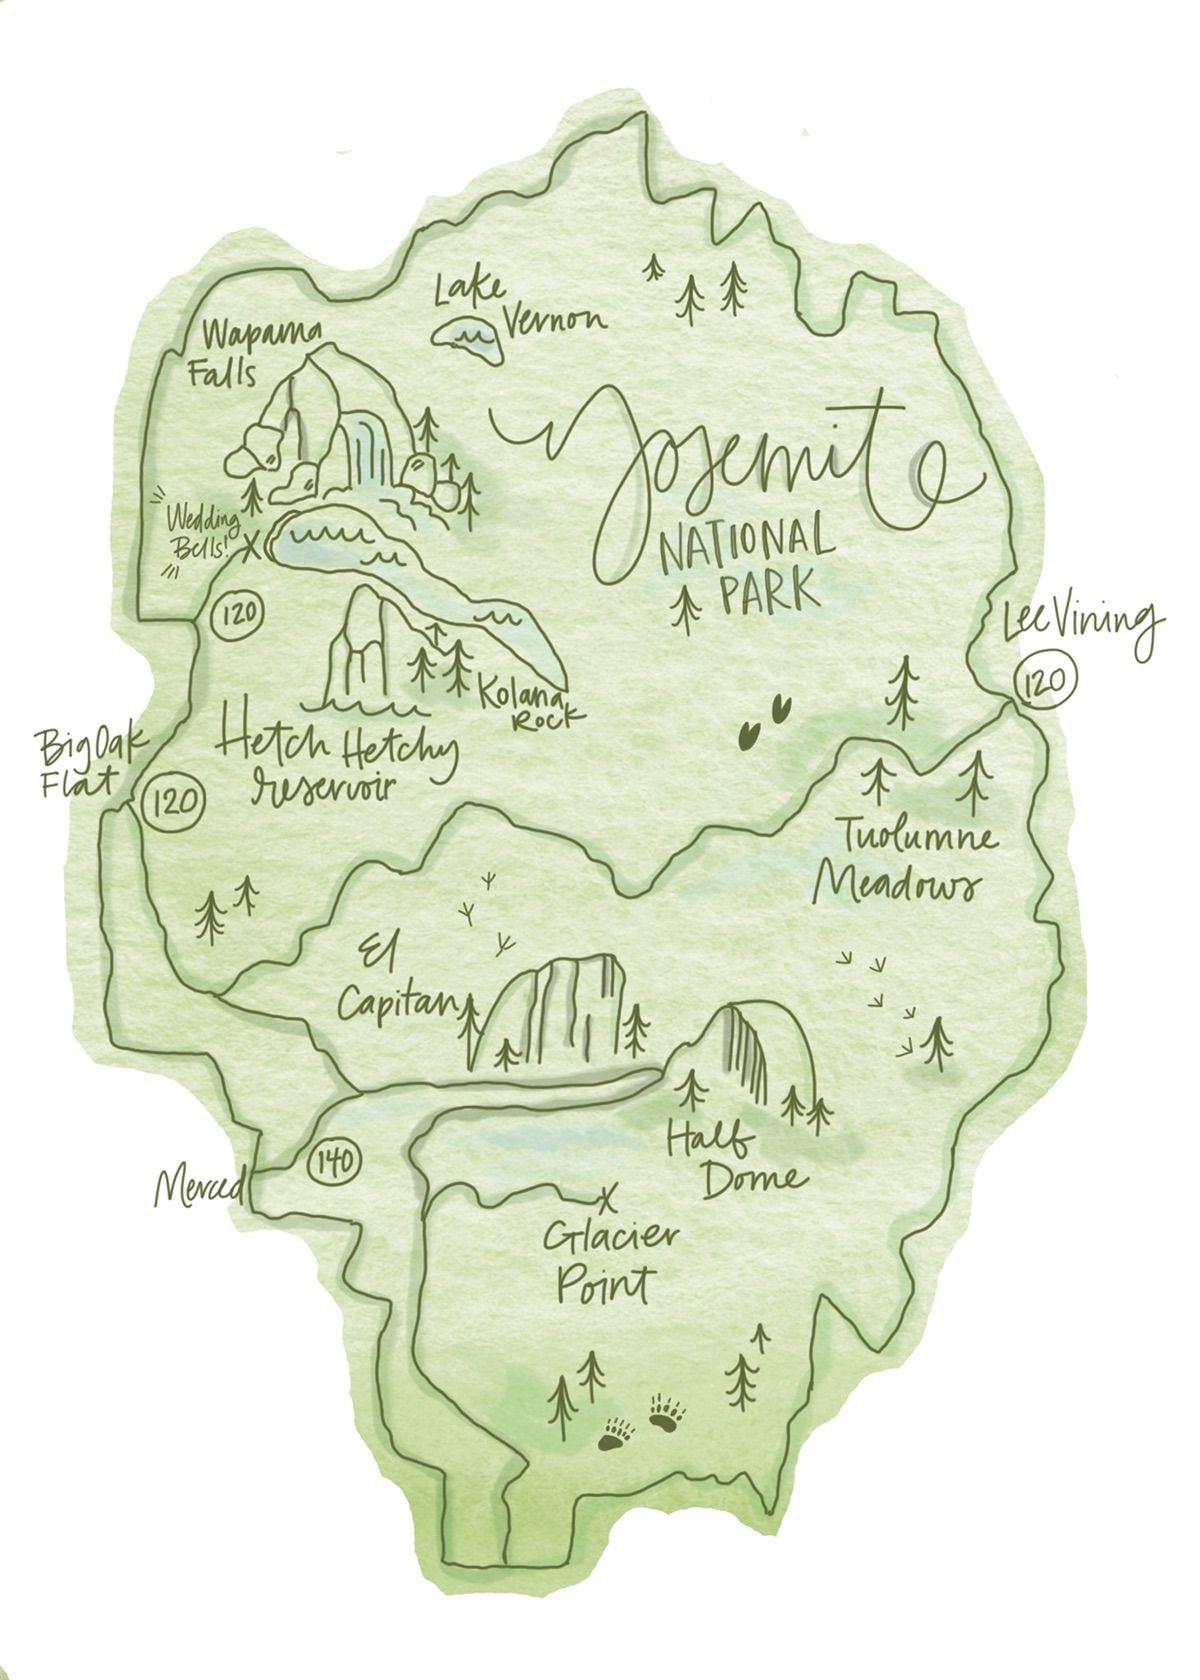 Yosemite National Park Map on Behance | USA | Pinterest | Yosemite ...